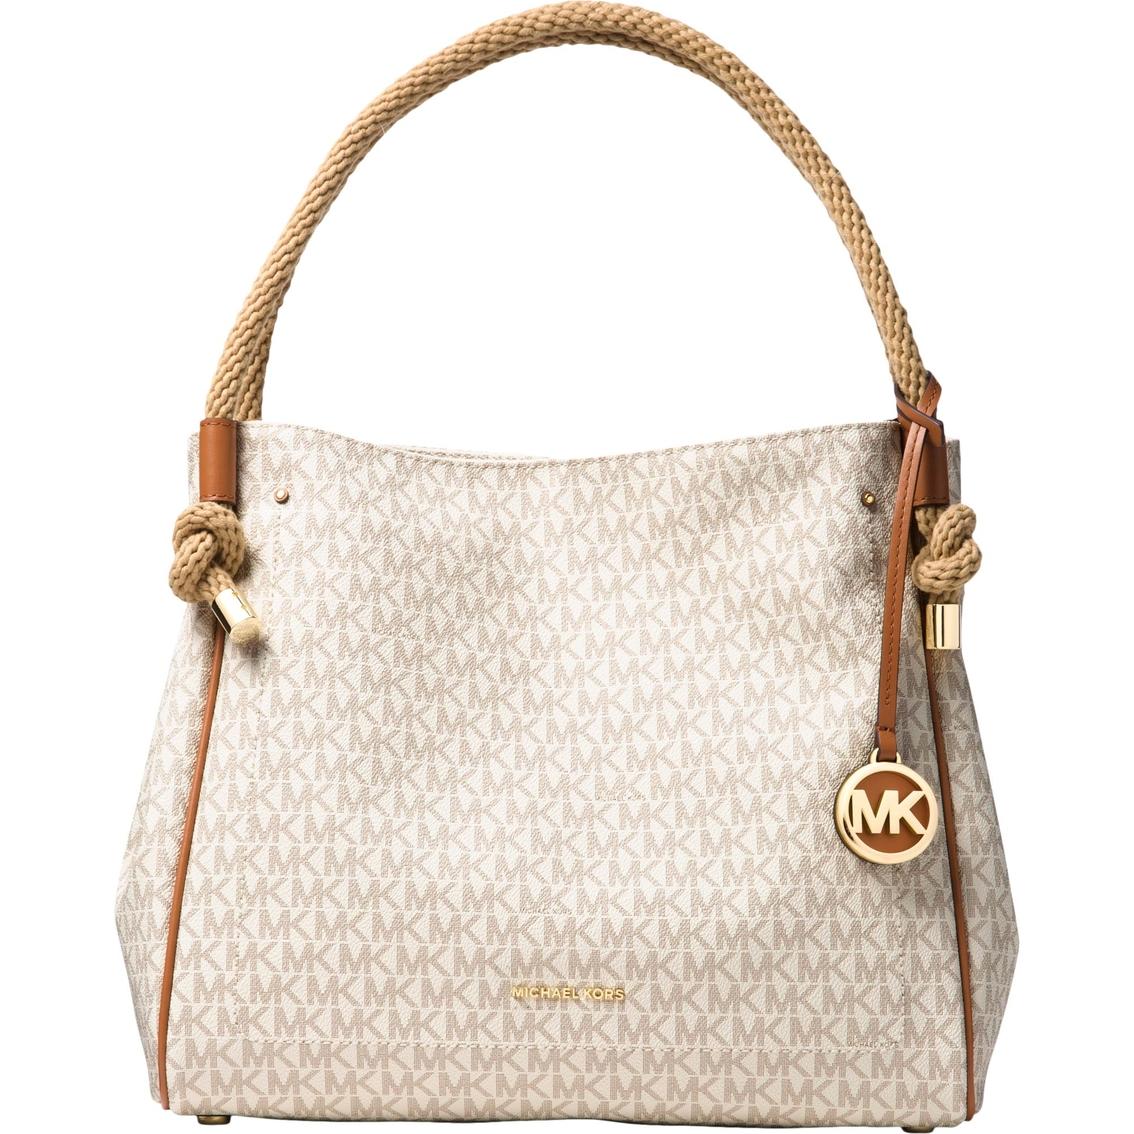 Michael Kors Isla Large Grab Bag | Totes & Shoppers